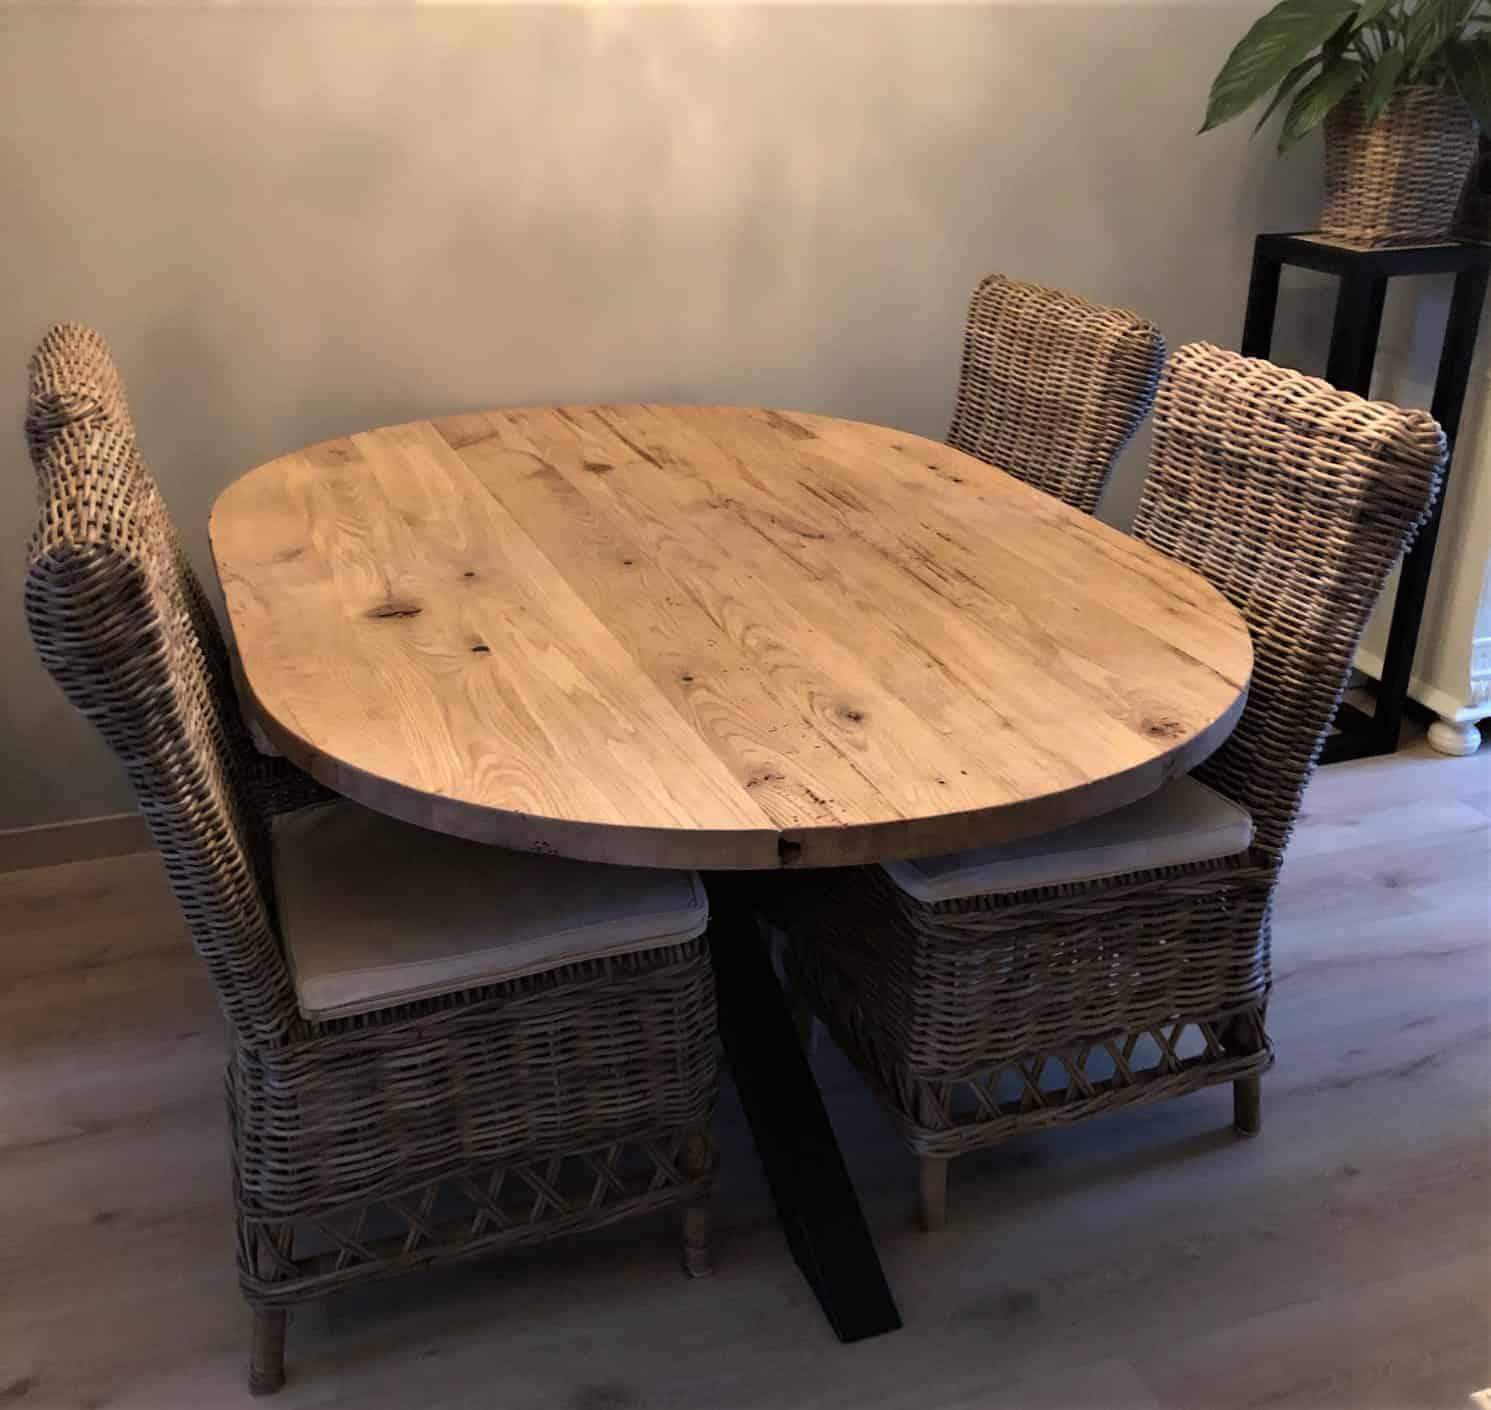 Geschaafd oud eiken recht ovale tafel met matrixpoot